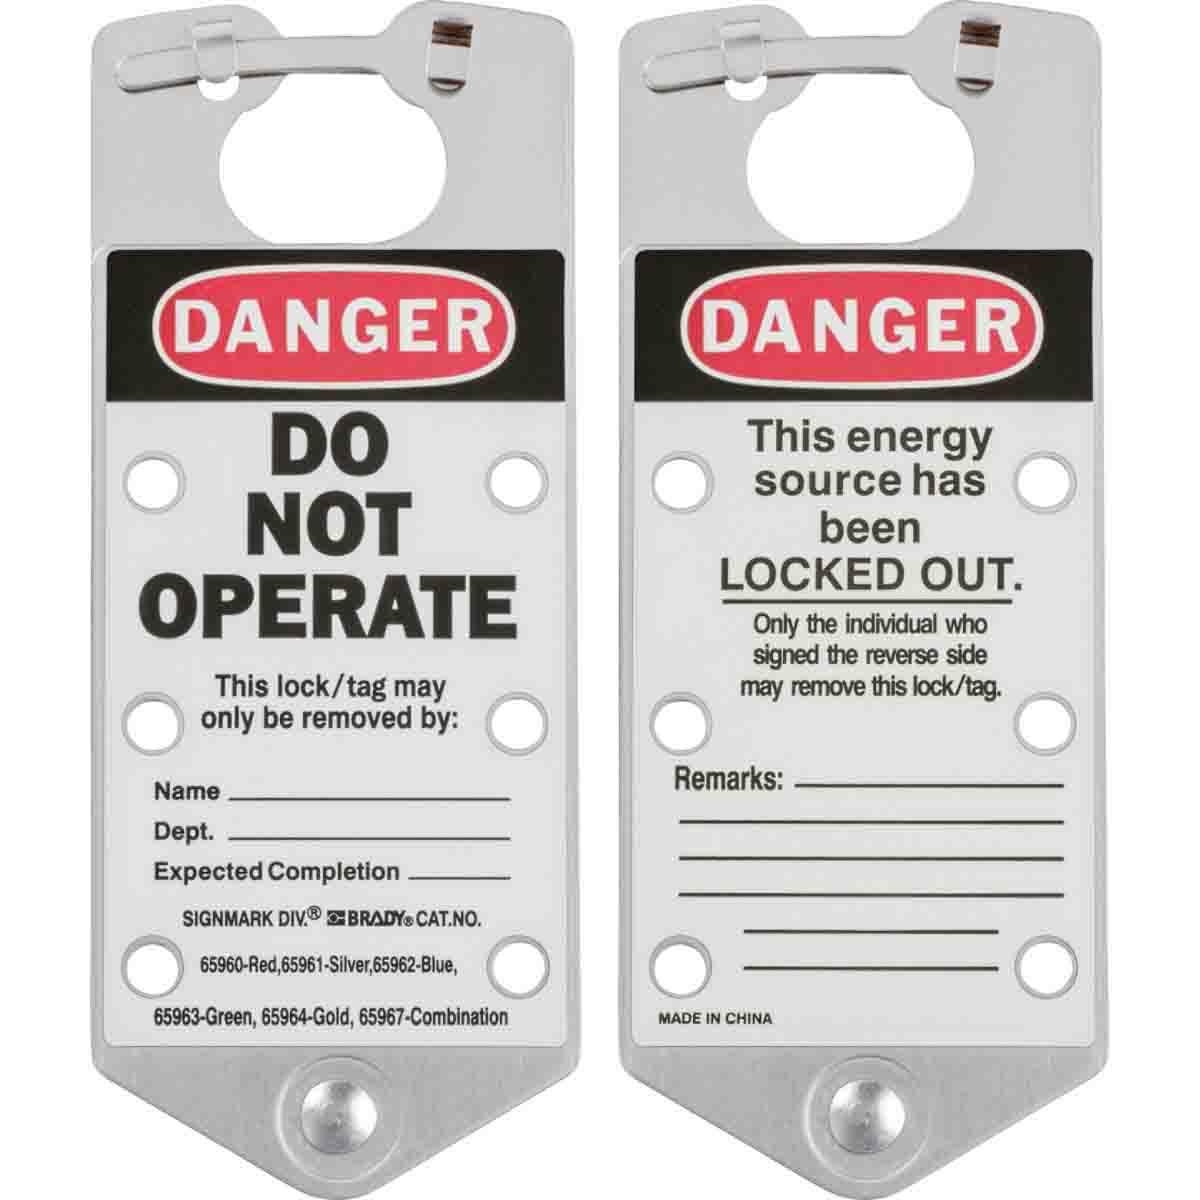 Brady® 65961 Labeled Snap-In Lockout Hasp With Interlocking Tabs, 6 Padlocks, 5/16 in Max Dia Padlock Shackle, Aluminum